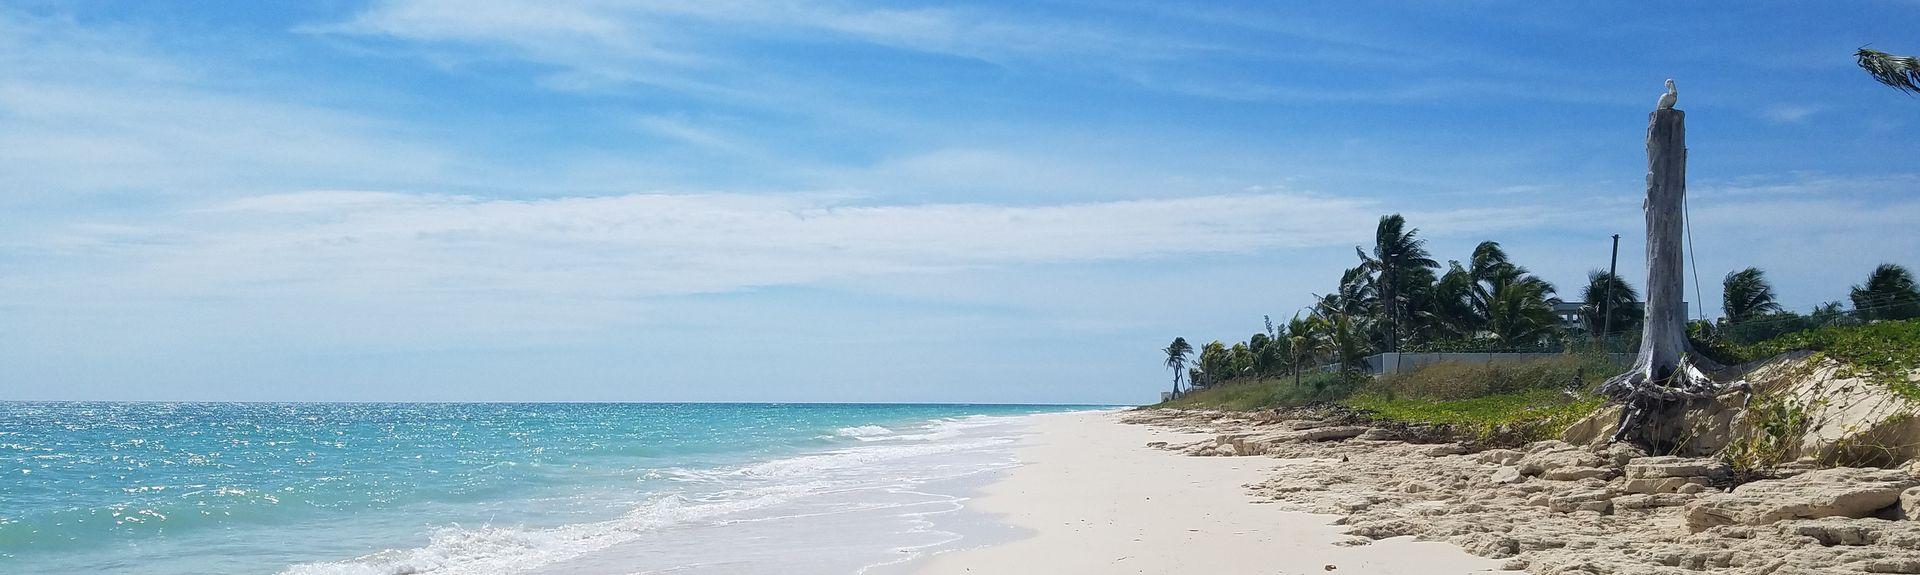 Windsor Park, Freeport, The Bahamas